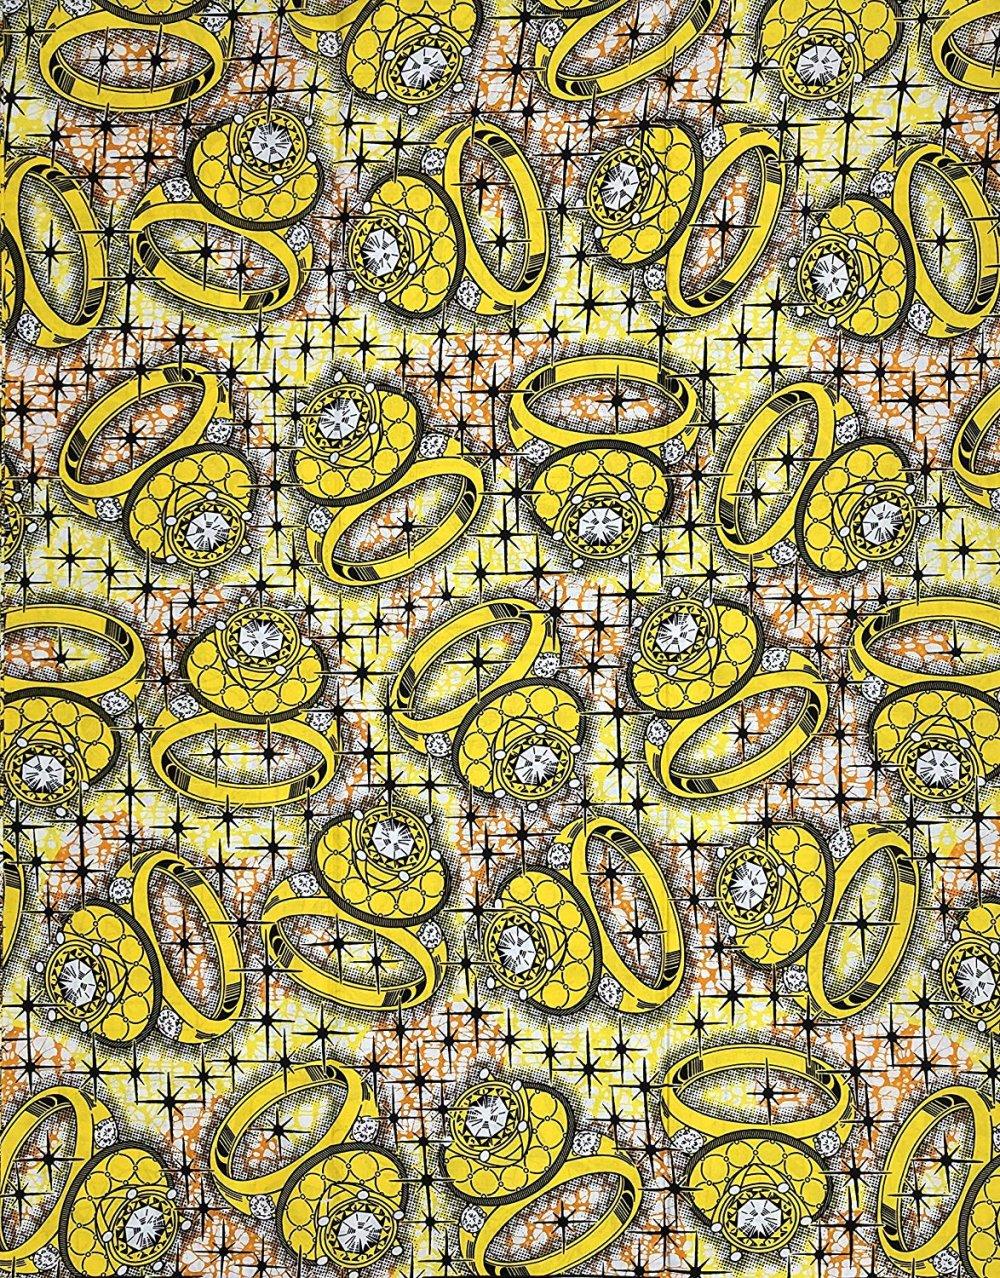 Wax pagne tissu africain collection HITARGET 6 Yards super cire imprimé pur COTON